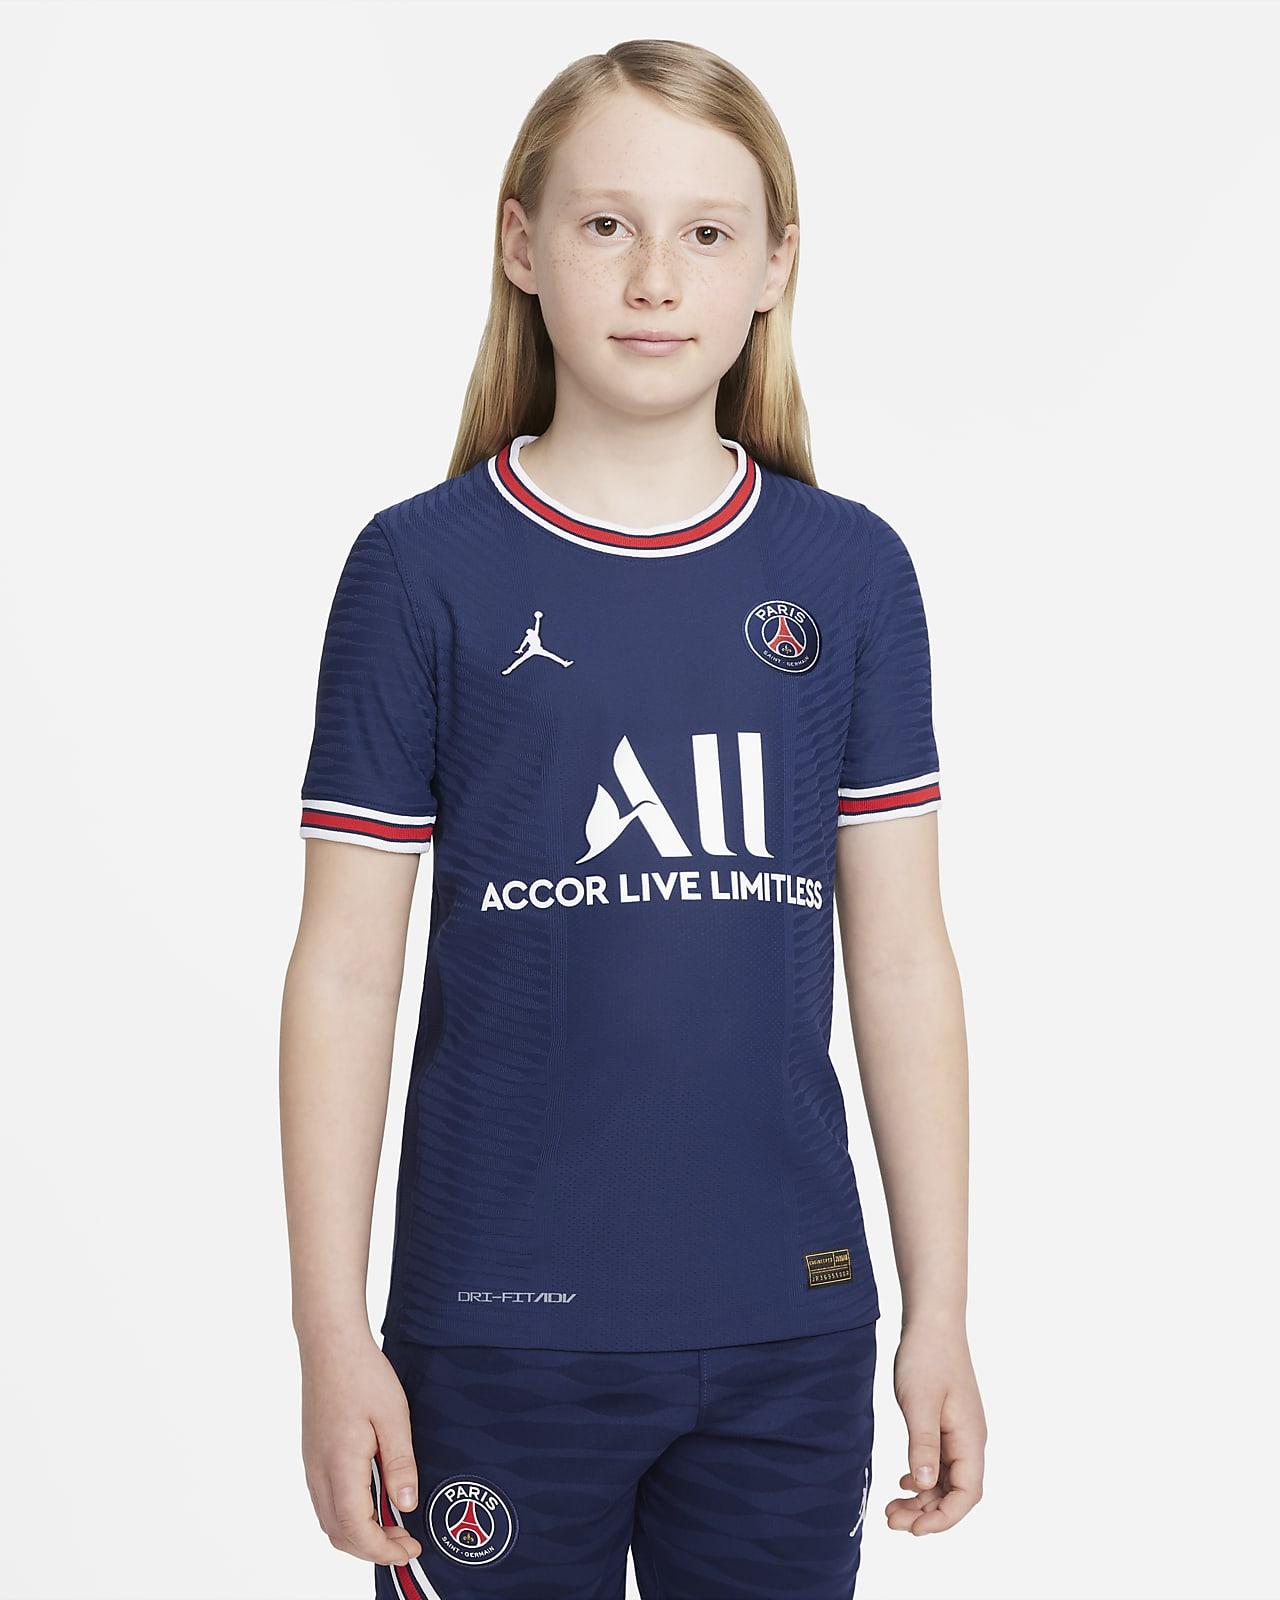 Camiseta de fútbol Nike Dri-FIT ADV para niños talla grande Paris Saint-Germain 2021/22 Match Home